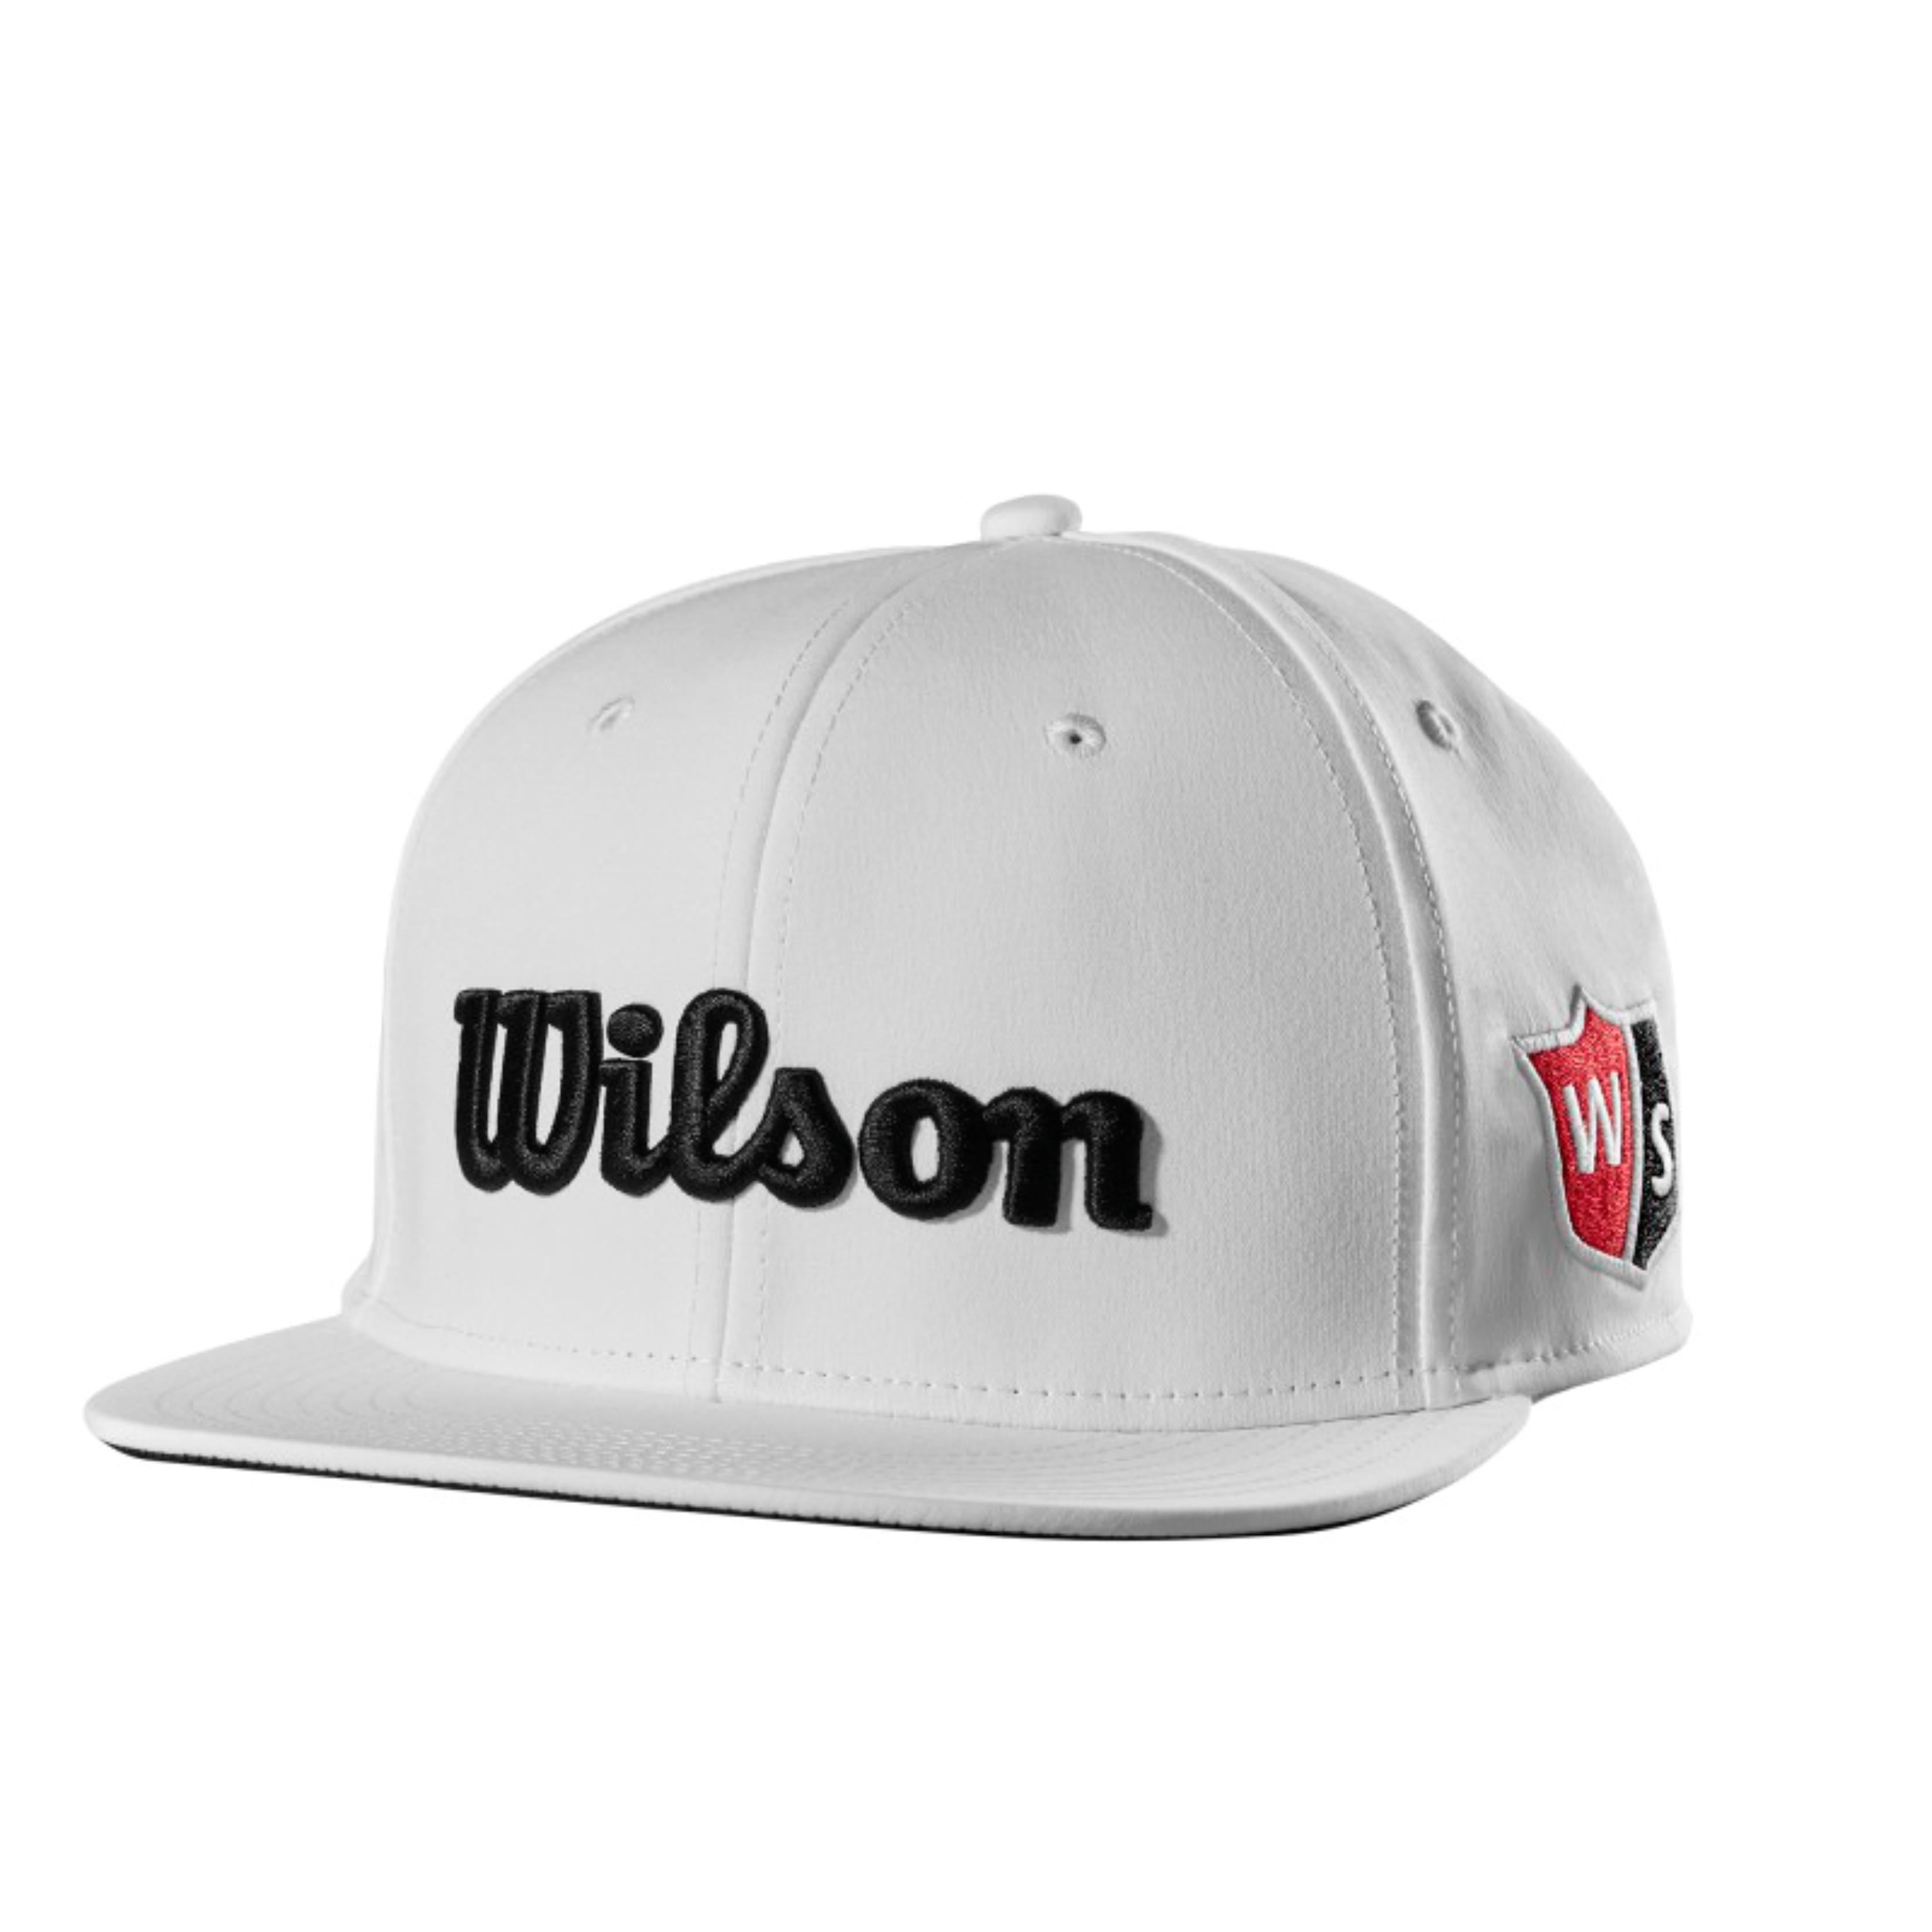 Wilson Staff Flat Brim Cap - Golfshop Maas 986e9ba89a0f